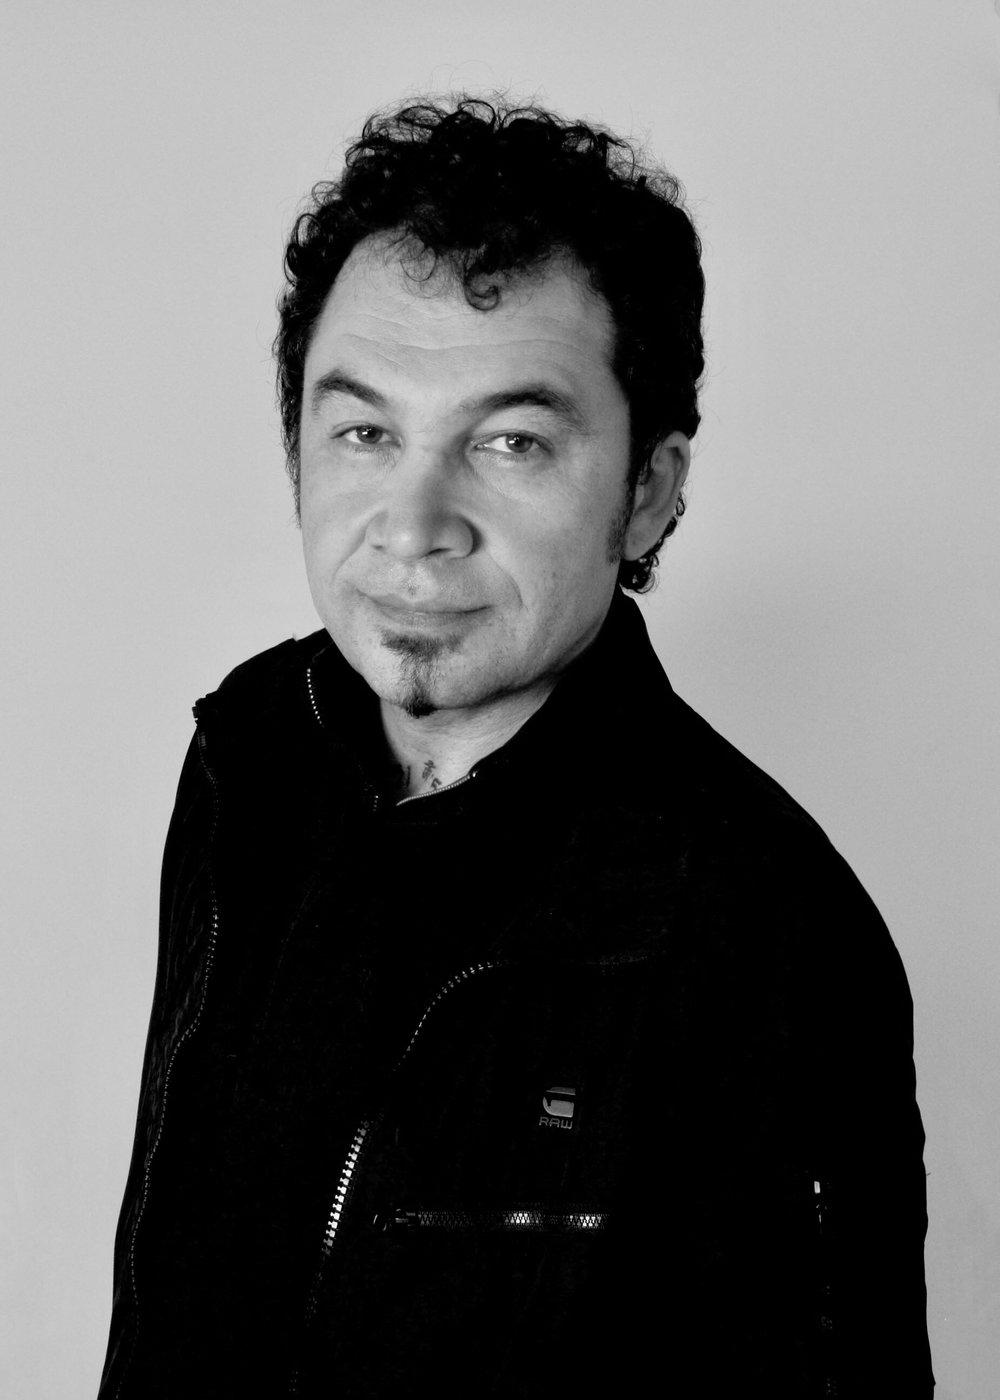 Boris Kofman